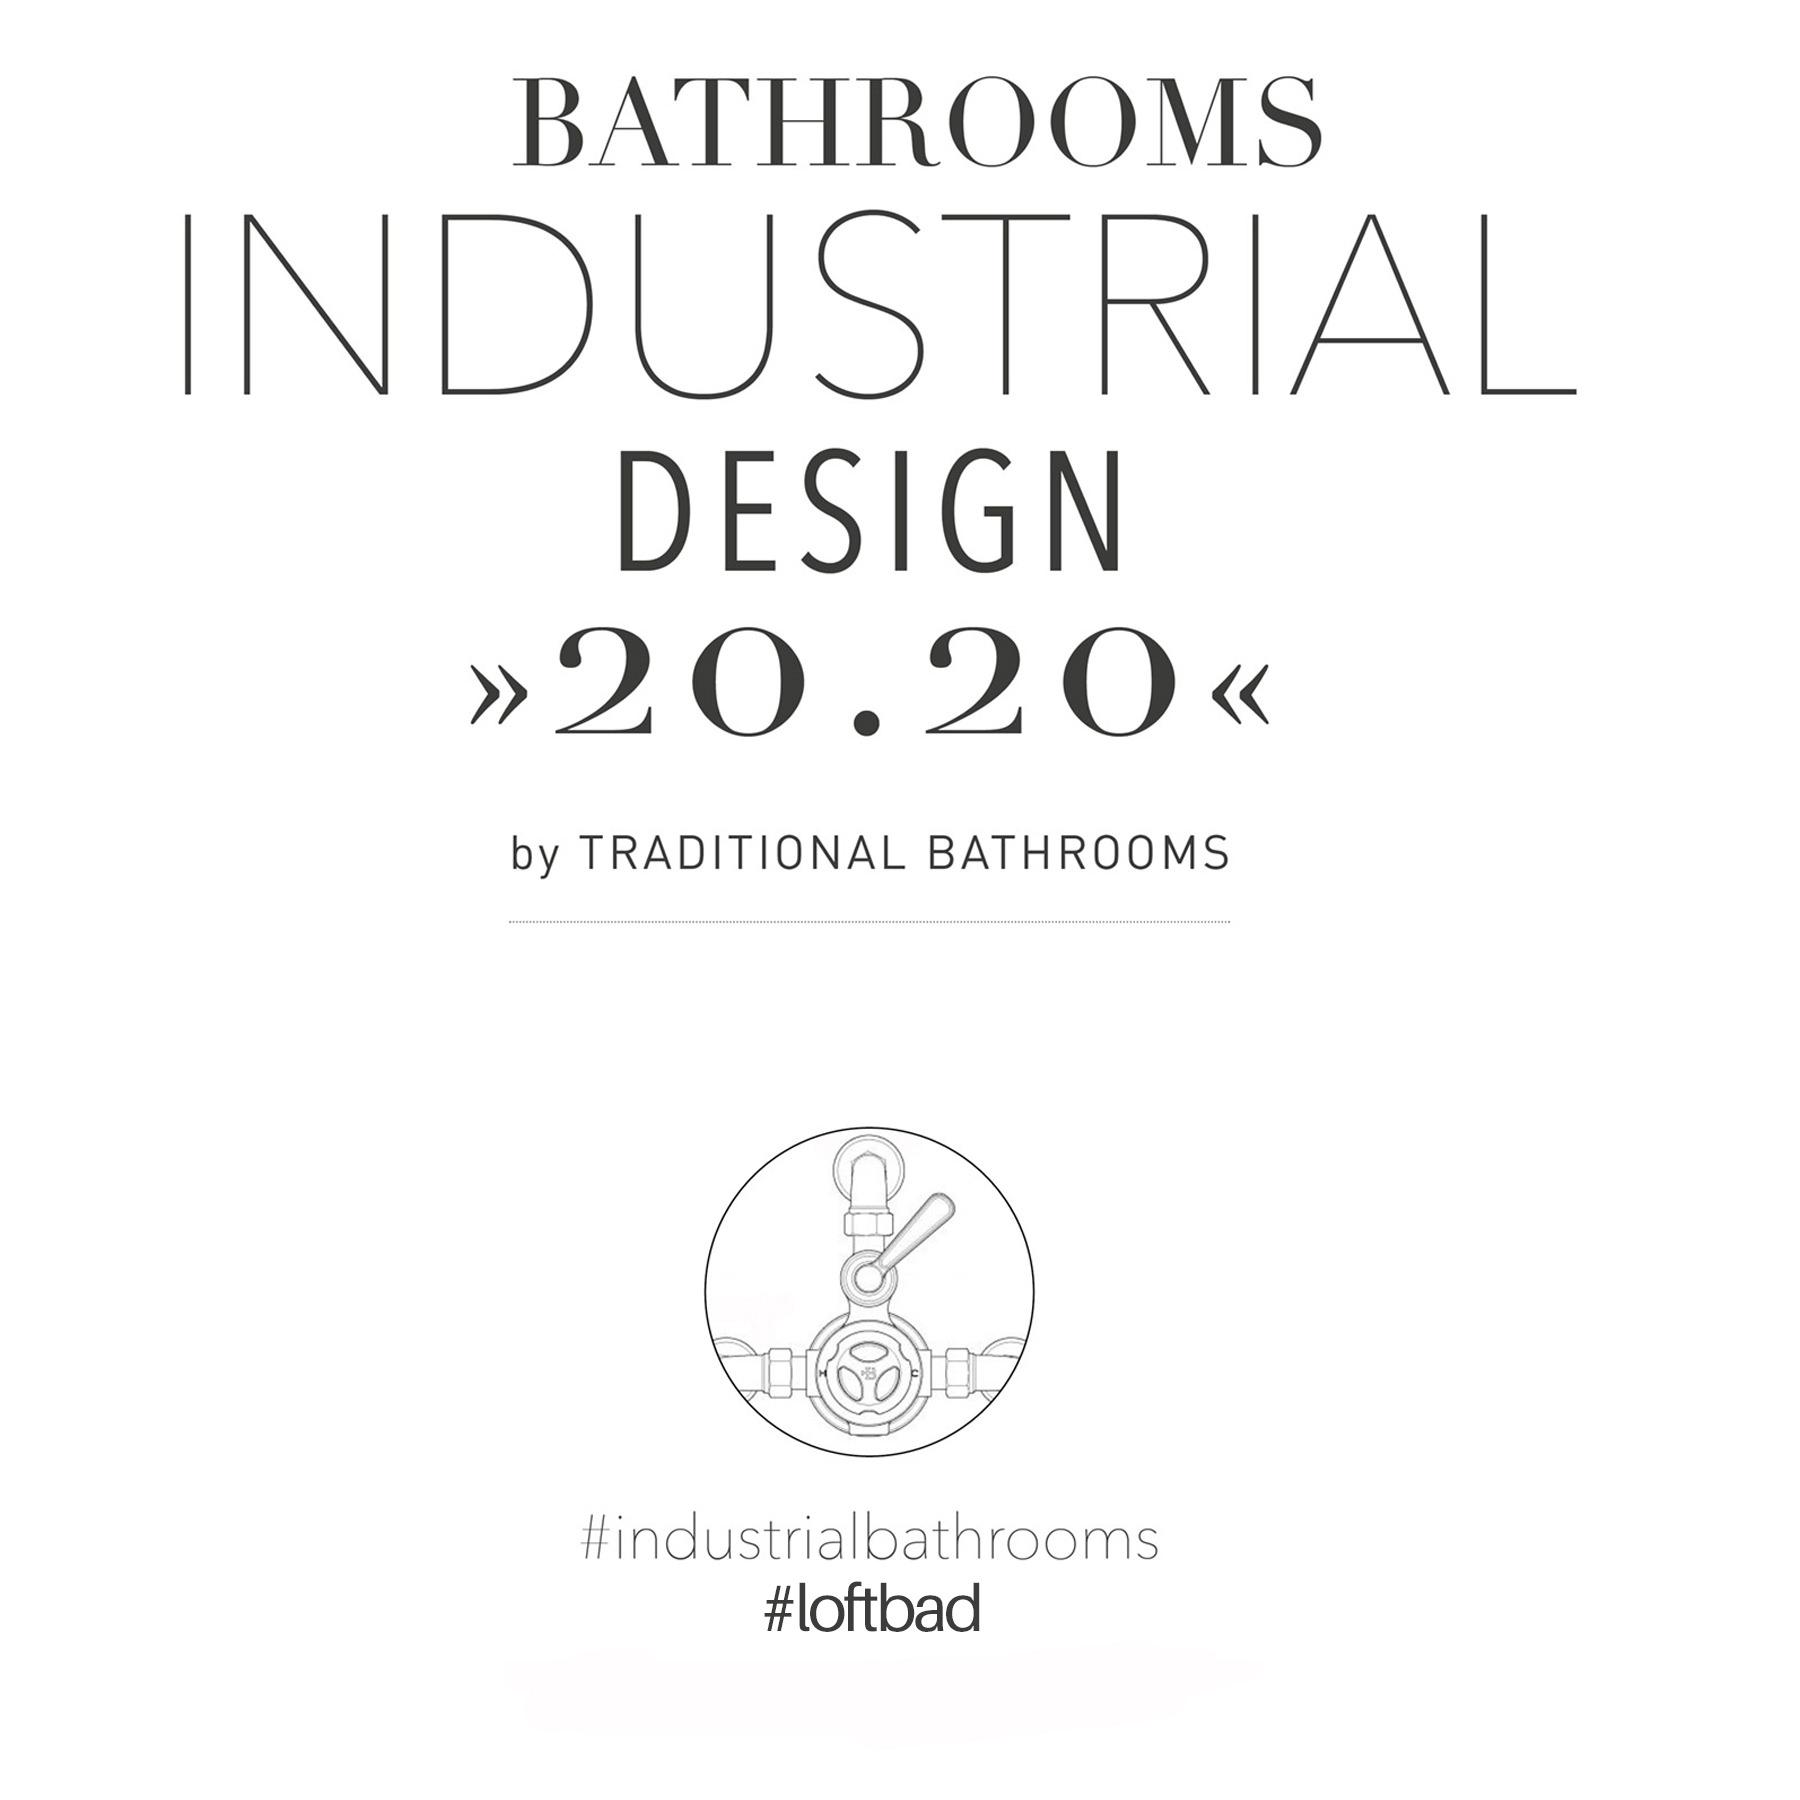 TB-industrialbathrooms